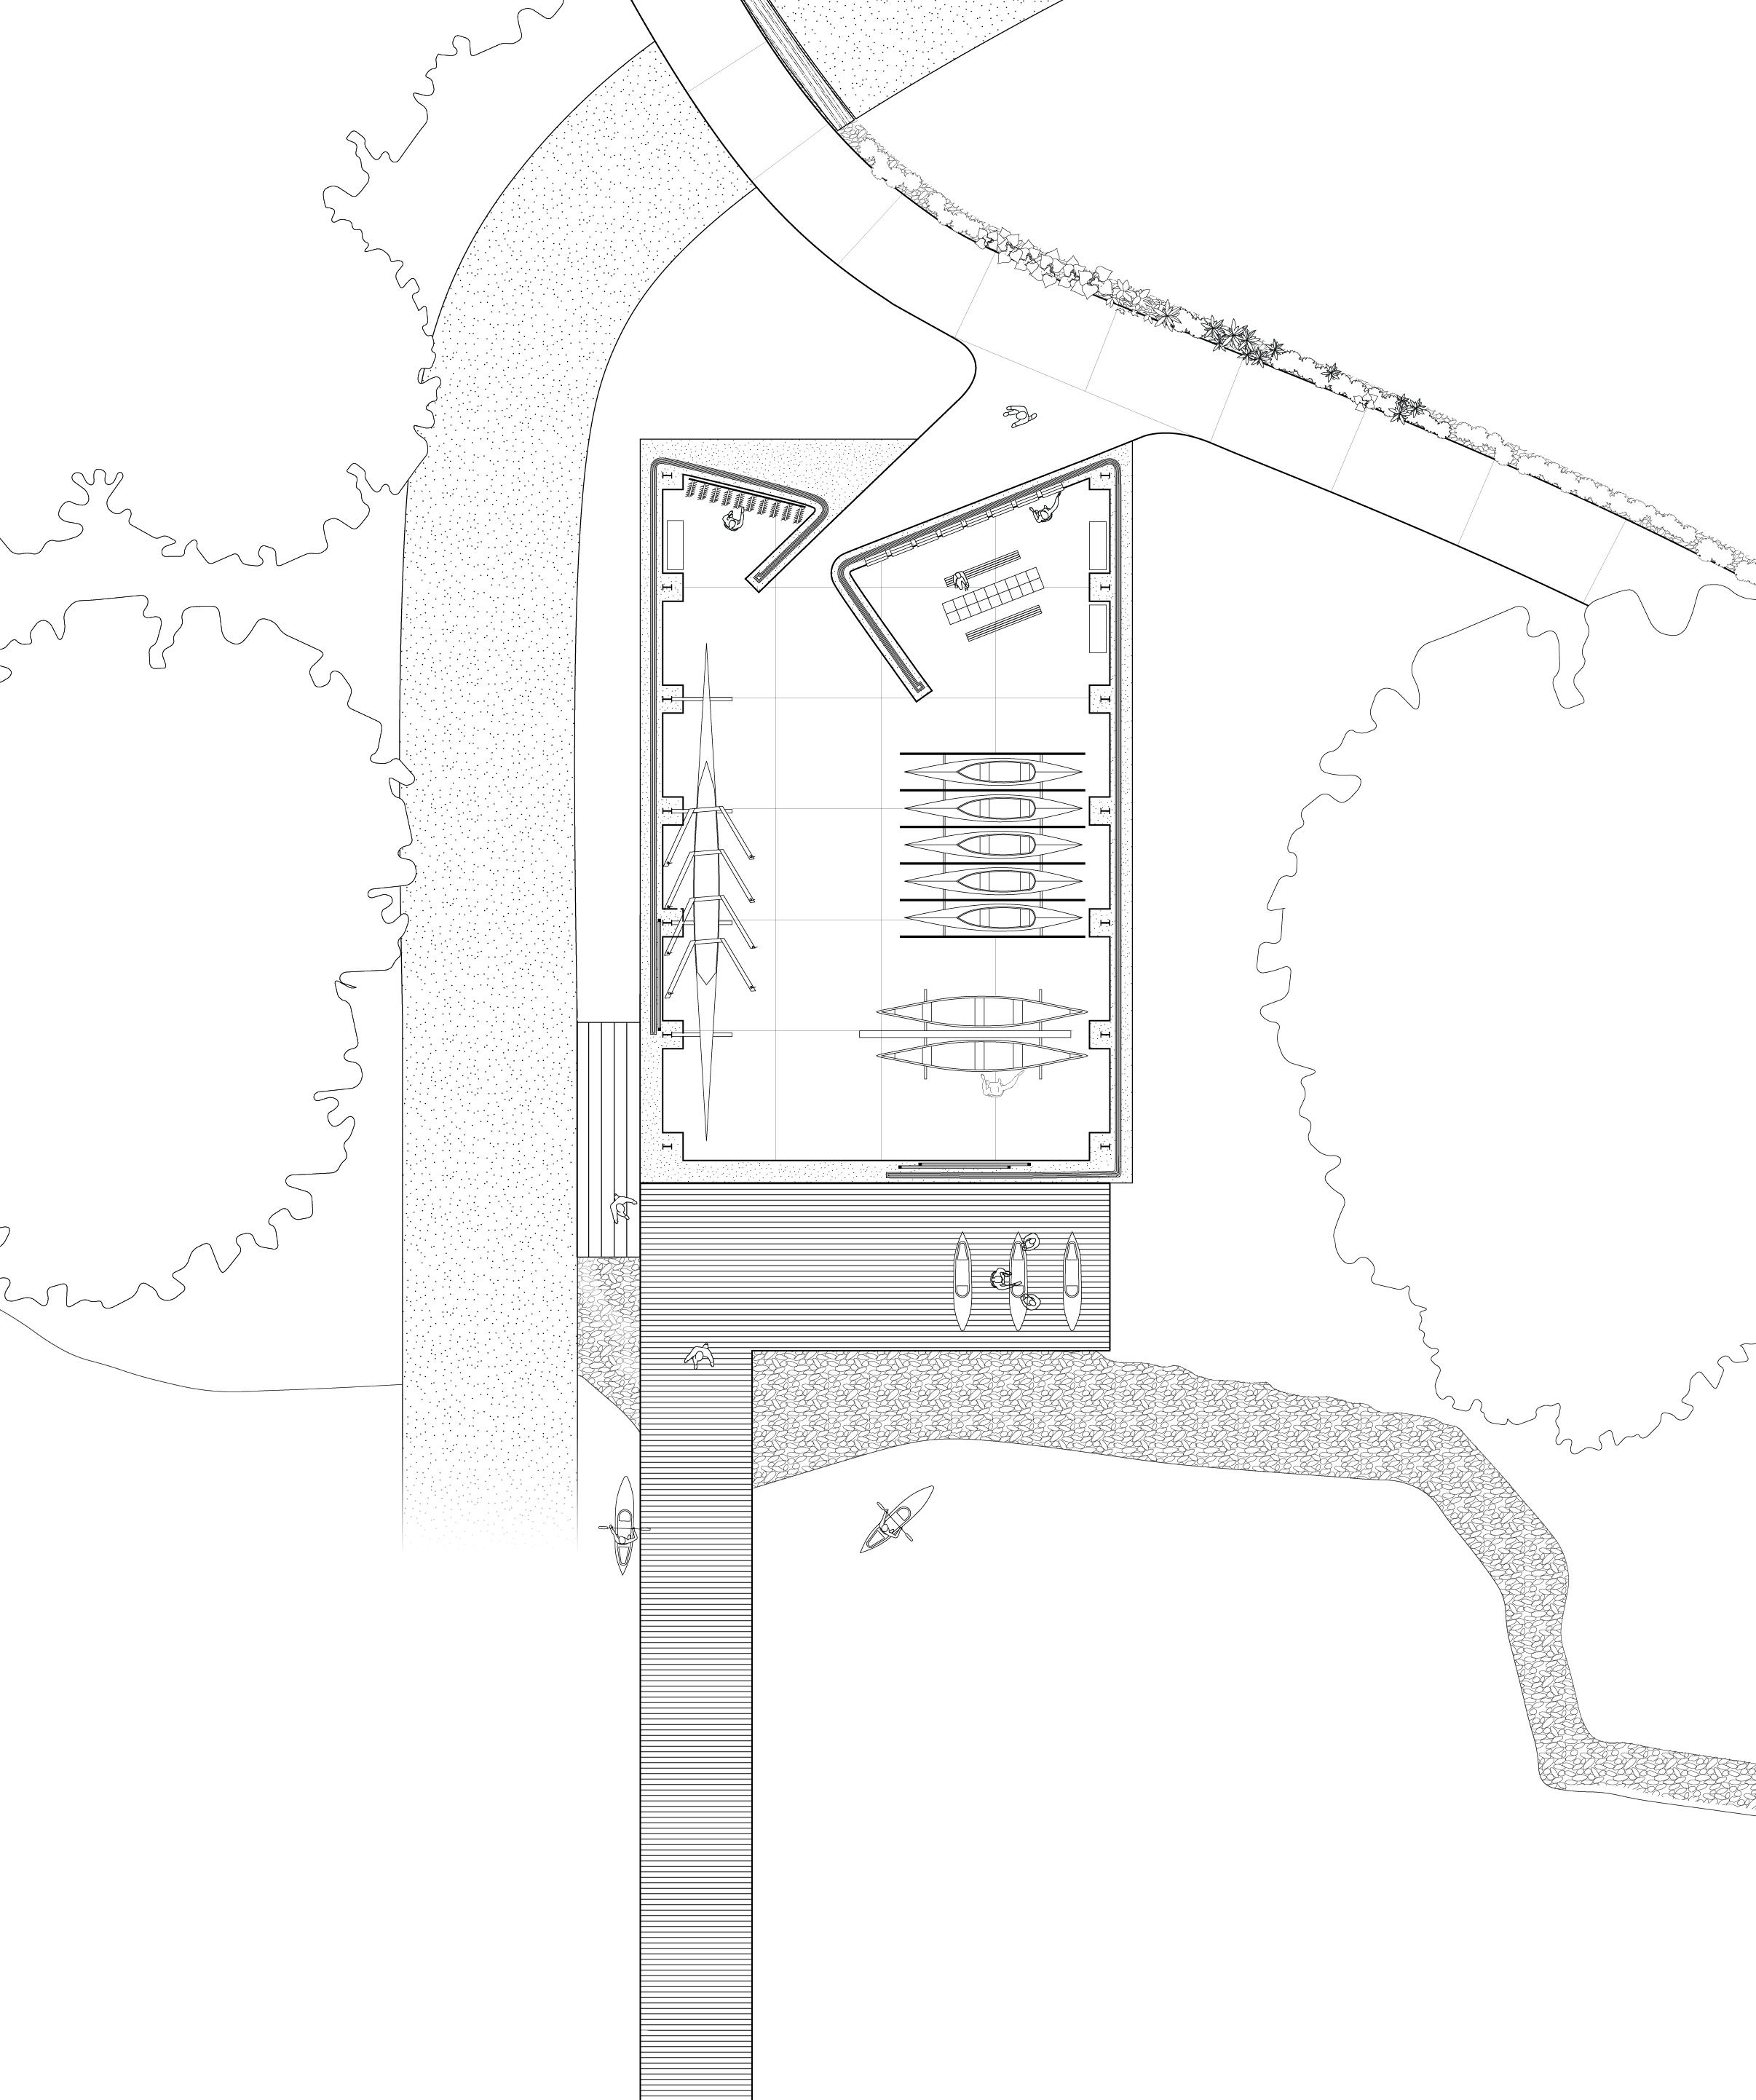 boat storage plan-01.jpg